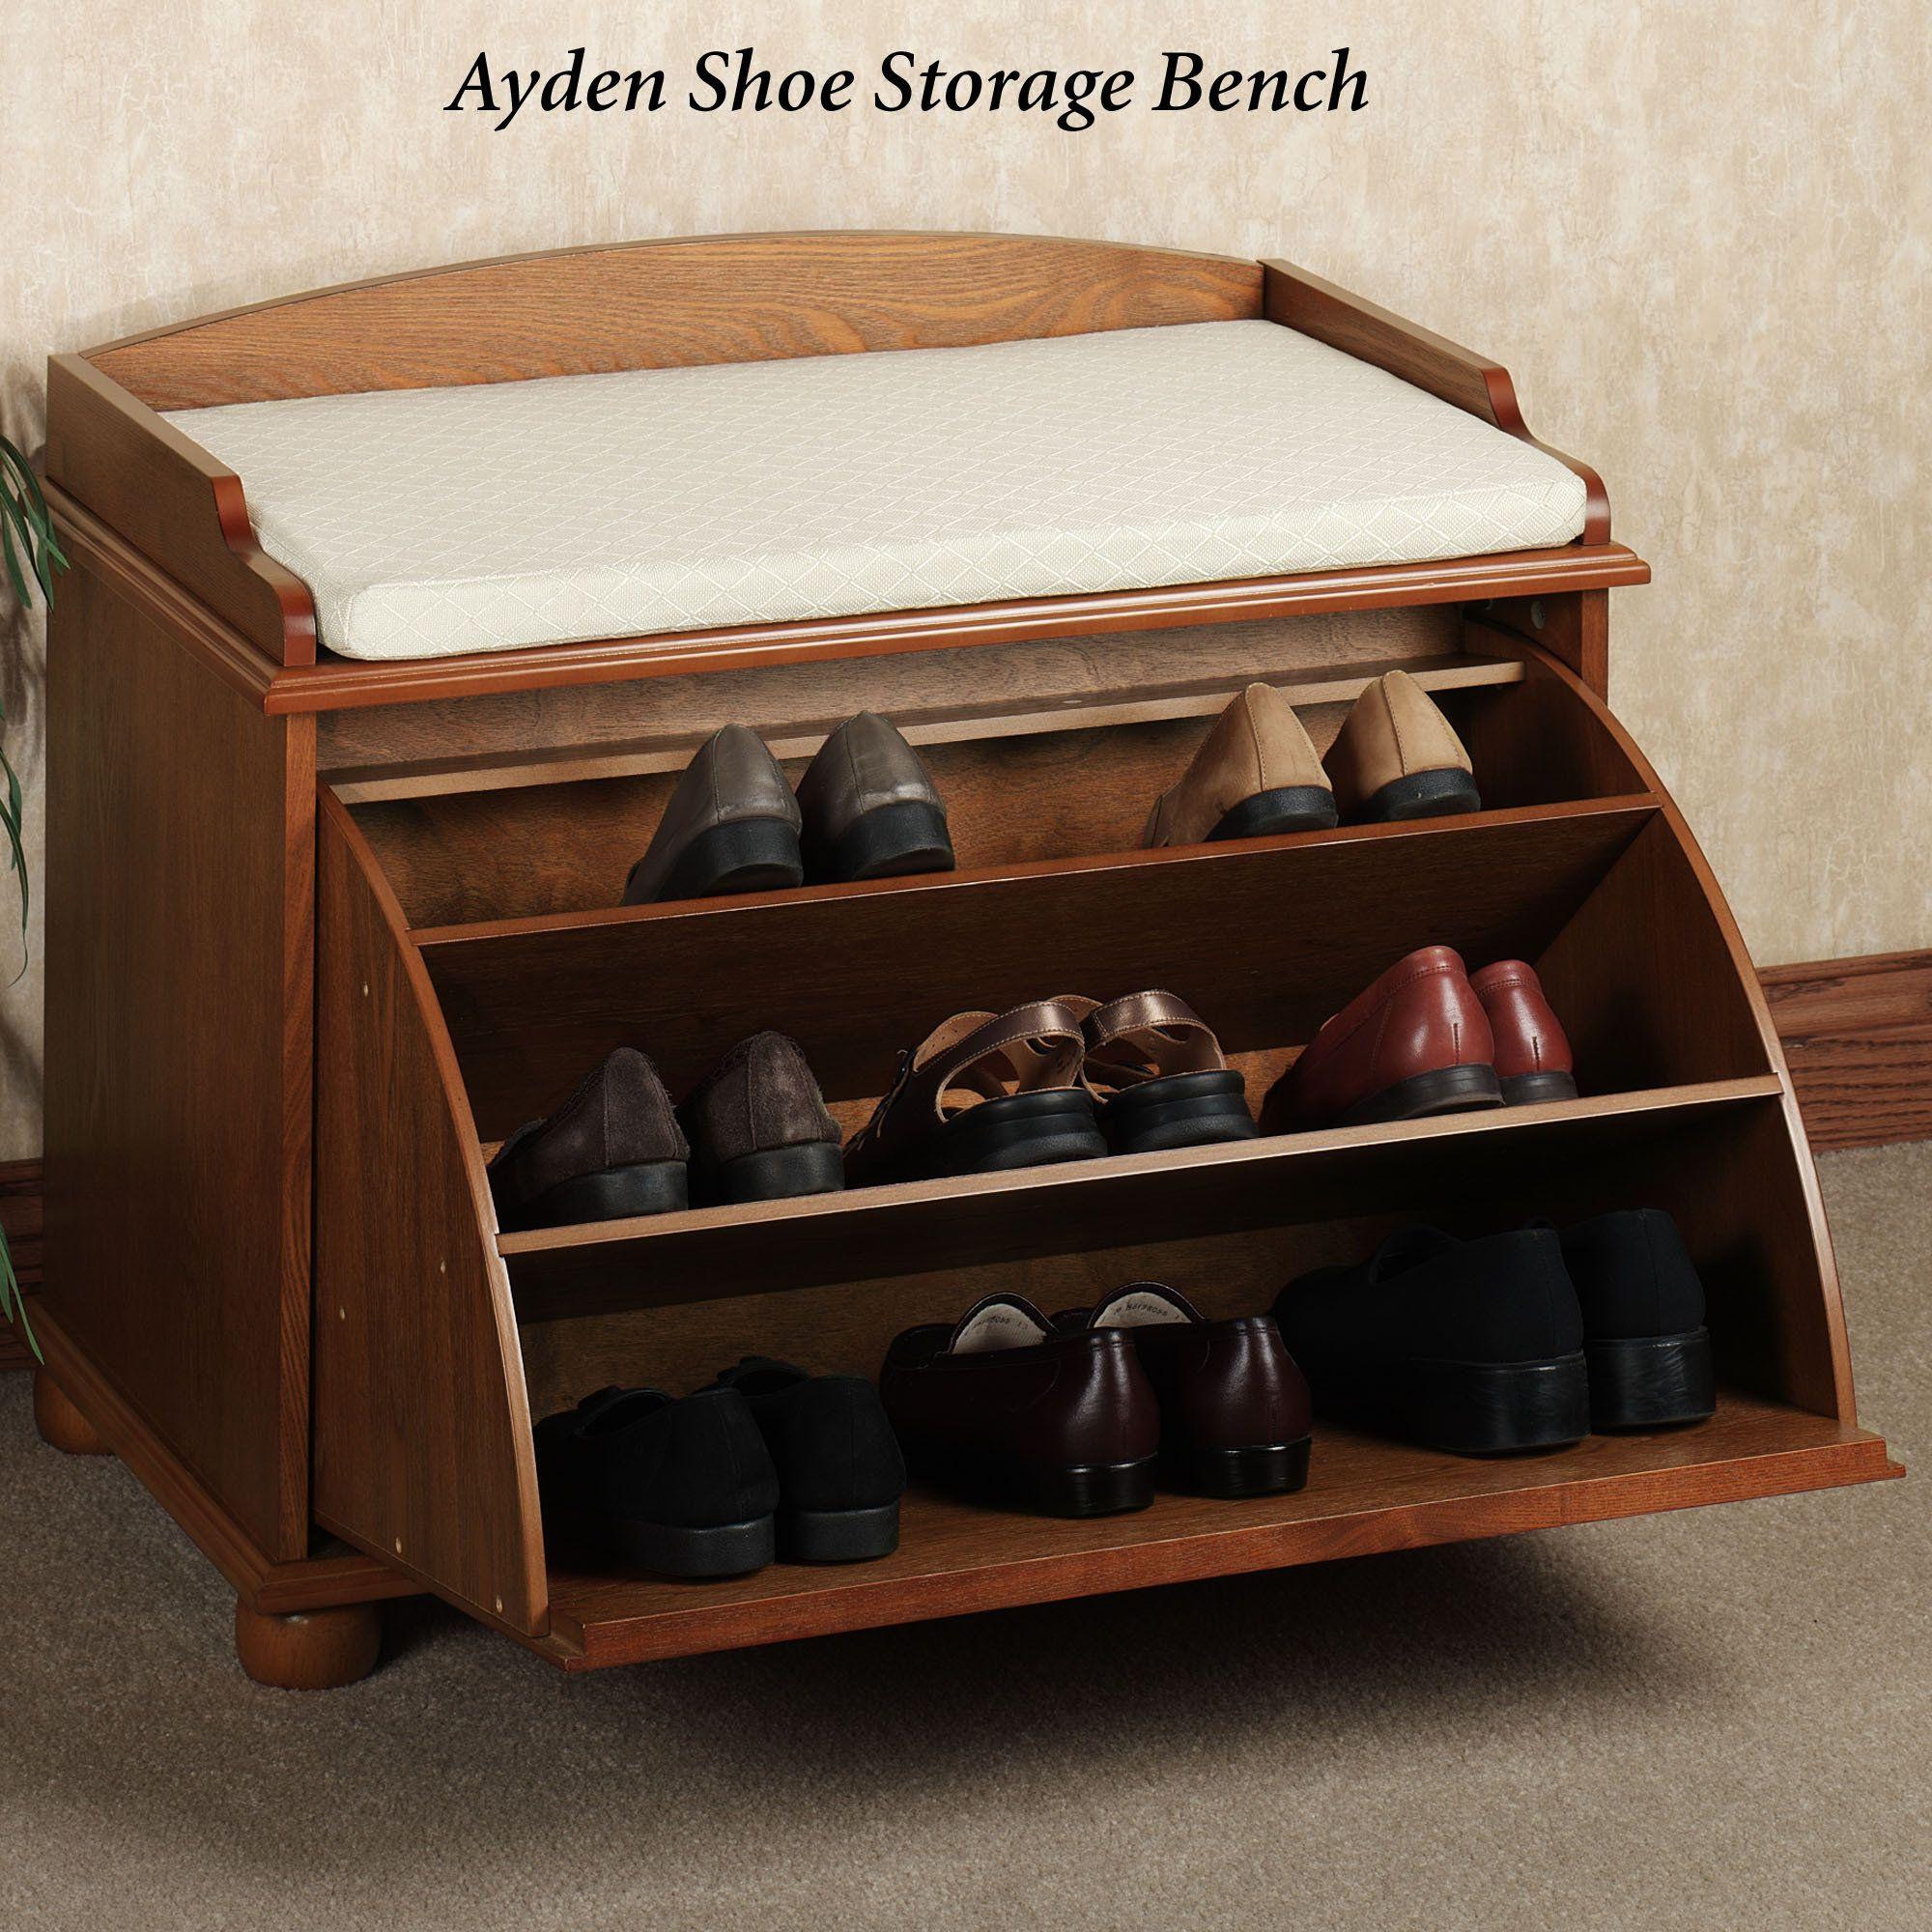 Auston Shoe Storage Bench Bench With Shoe Storage Storage Bench Designs Shoe Storage Cabinet